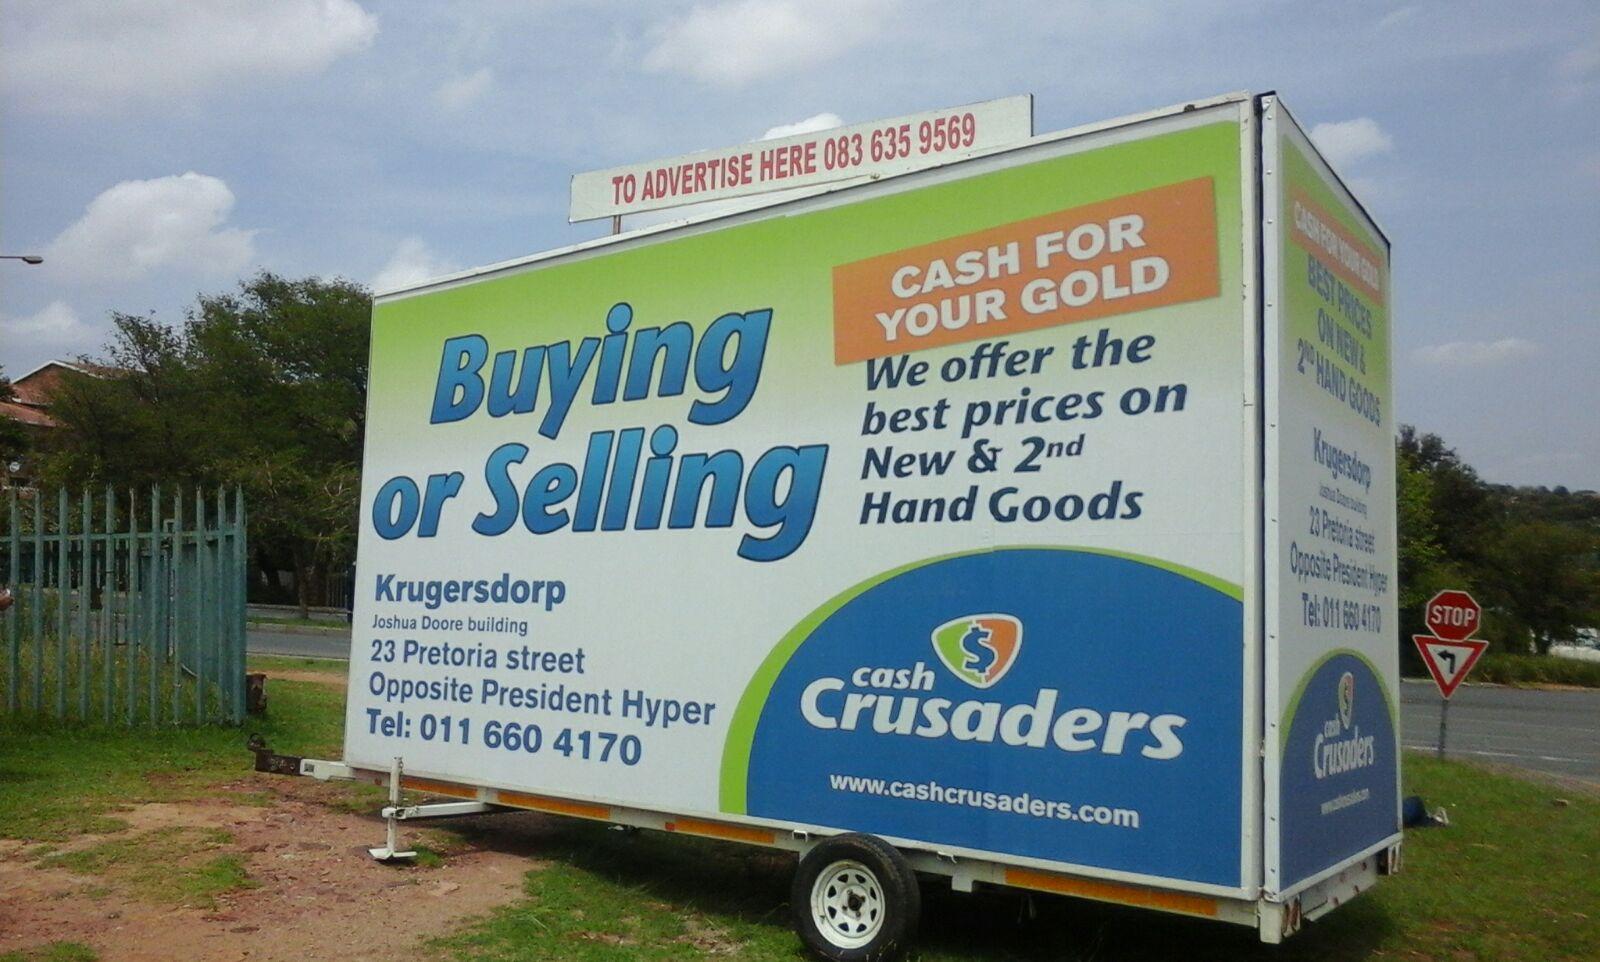 Cash Crusaders side 1 panel pic